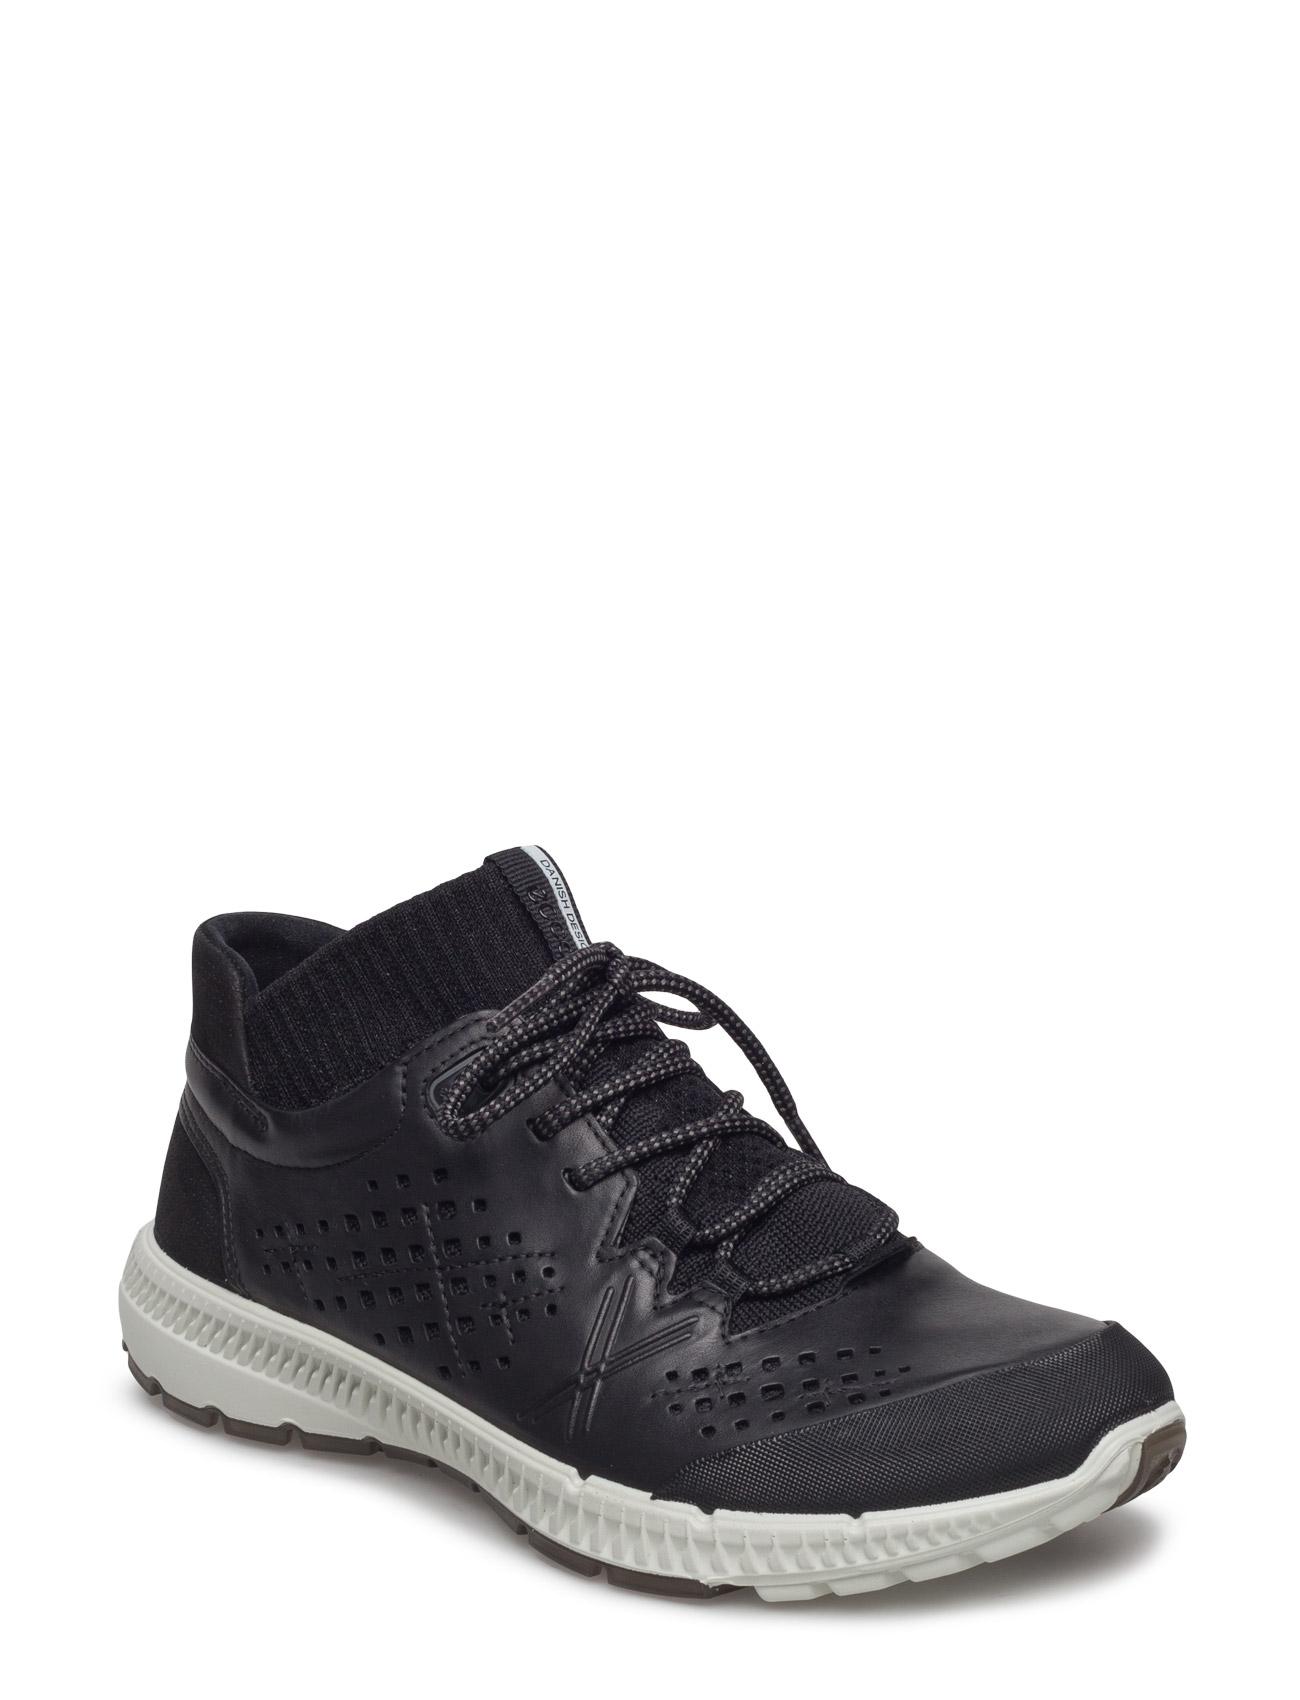 Intrinsic Tr ECCO Sneakers til Damer i